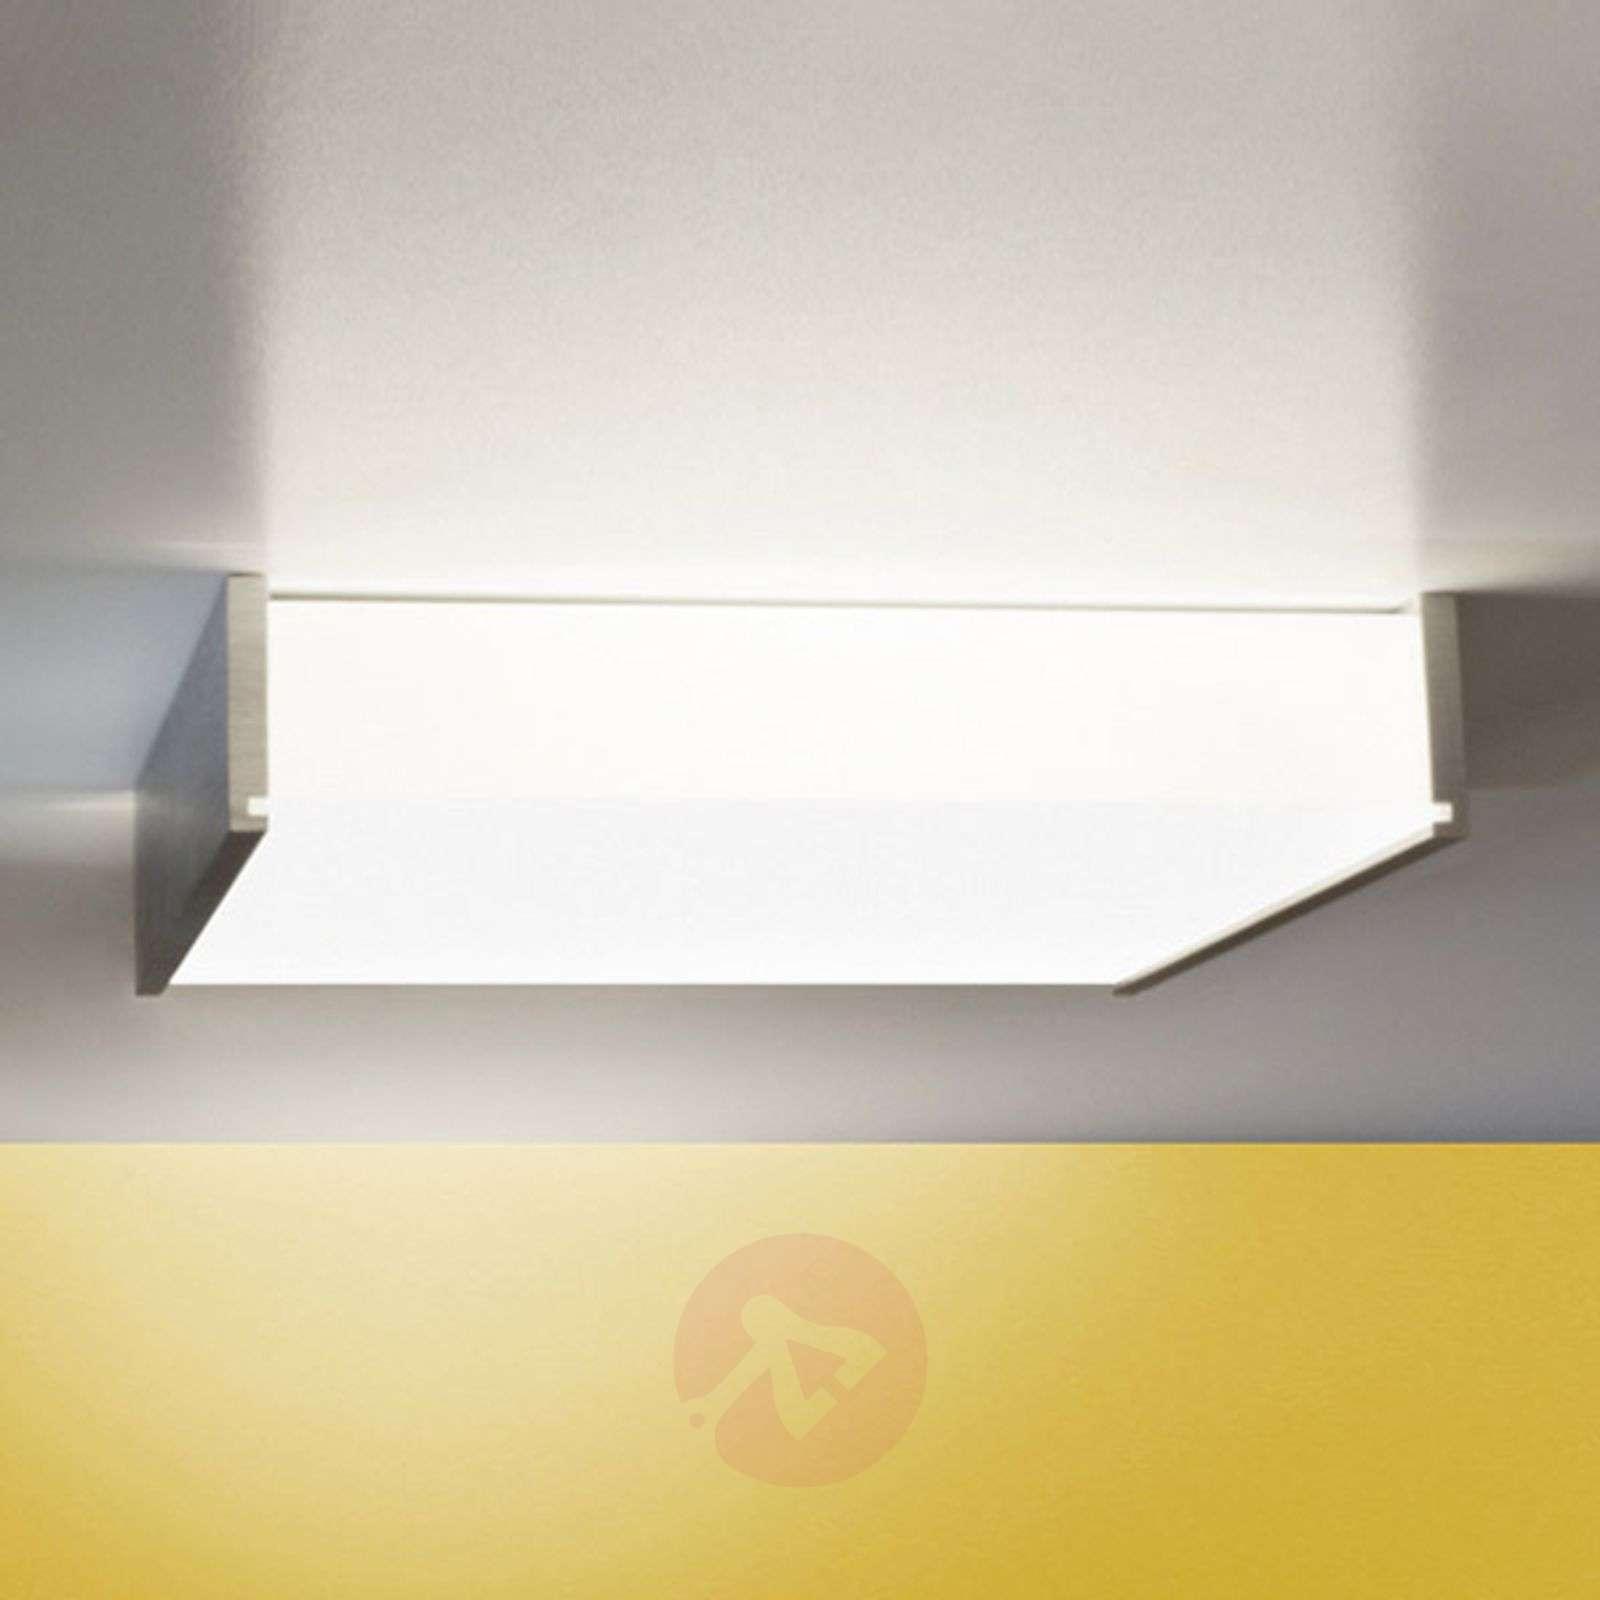 lightbox mehr kino schwarz gro tedi light led shop ansichten leuchtkasten box bunt gross